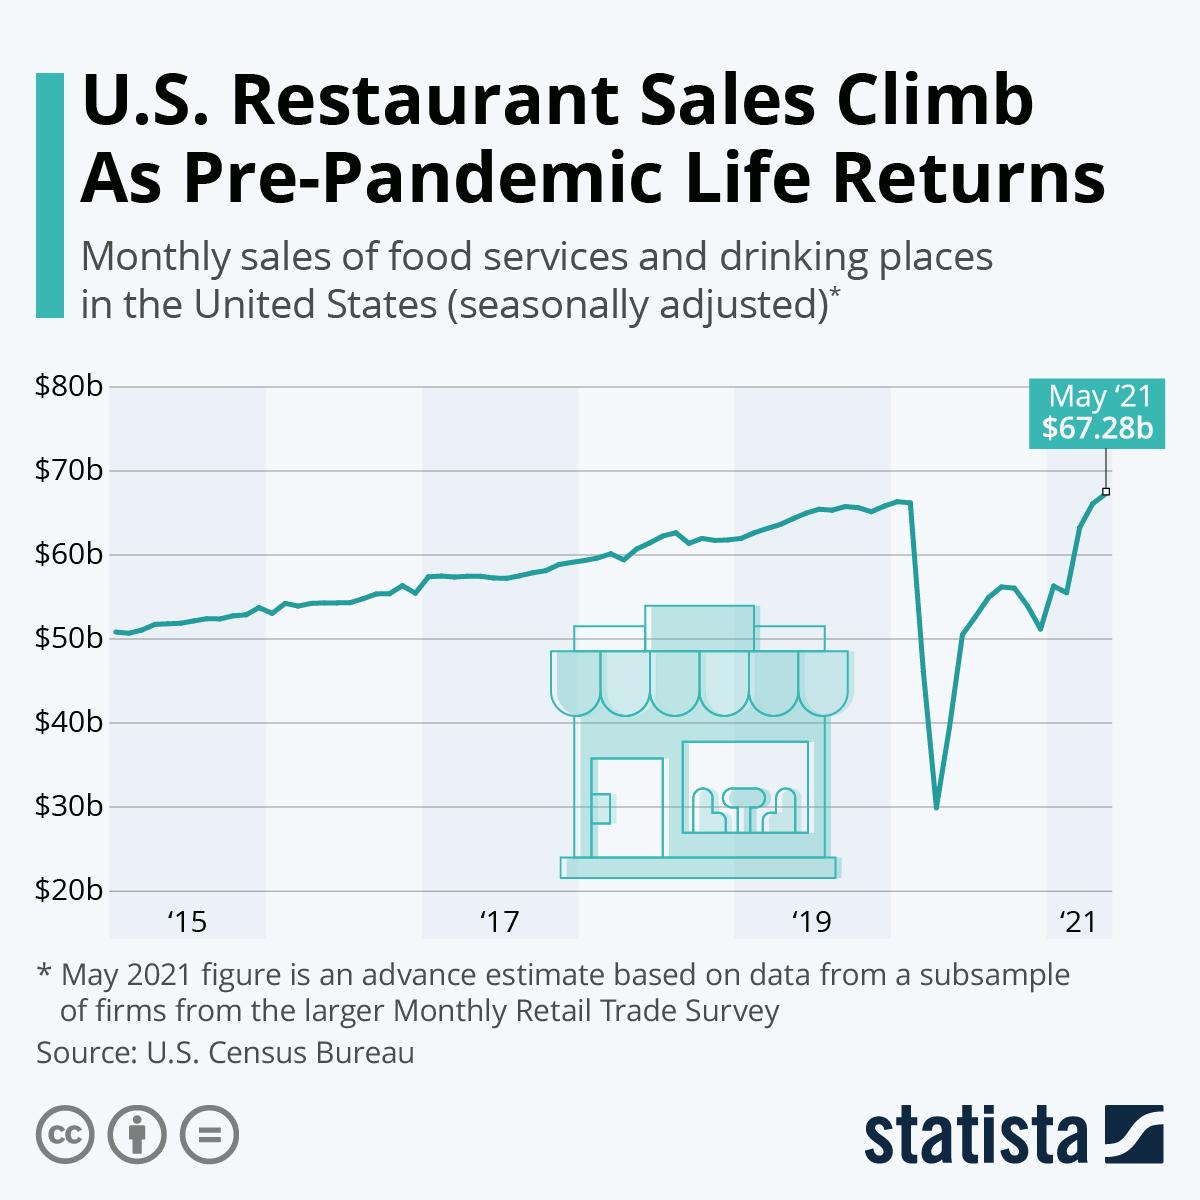 U.S. Restaurant Sales Climb As Pre-Pandemic Life Returns